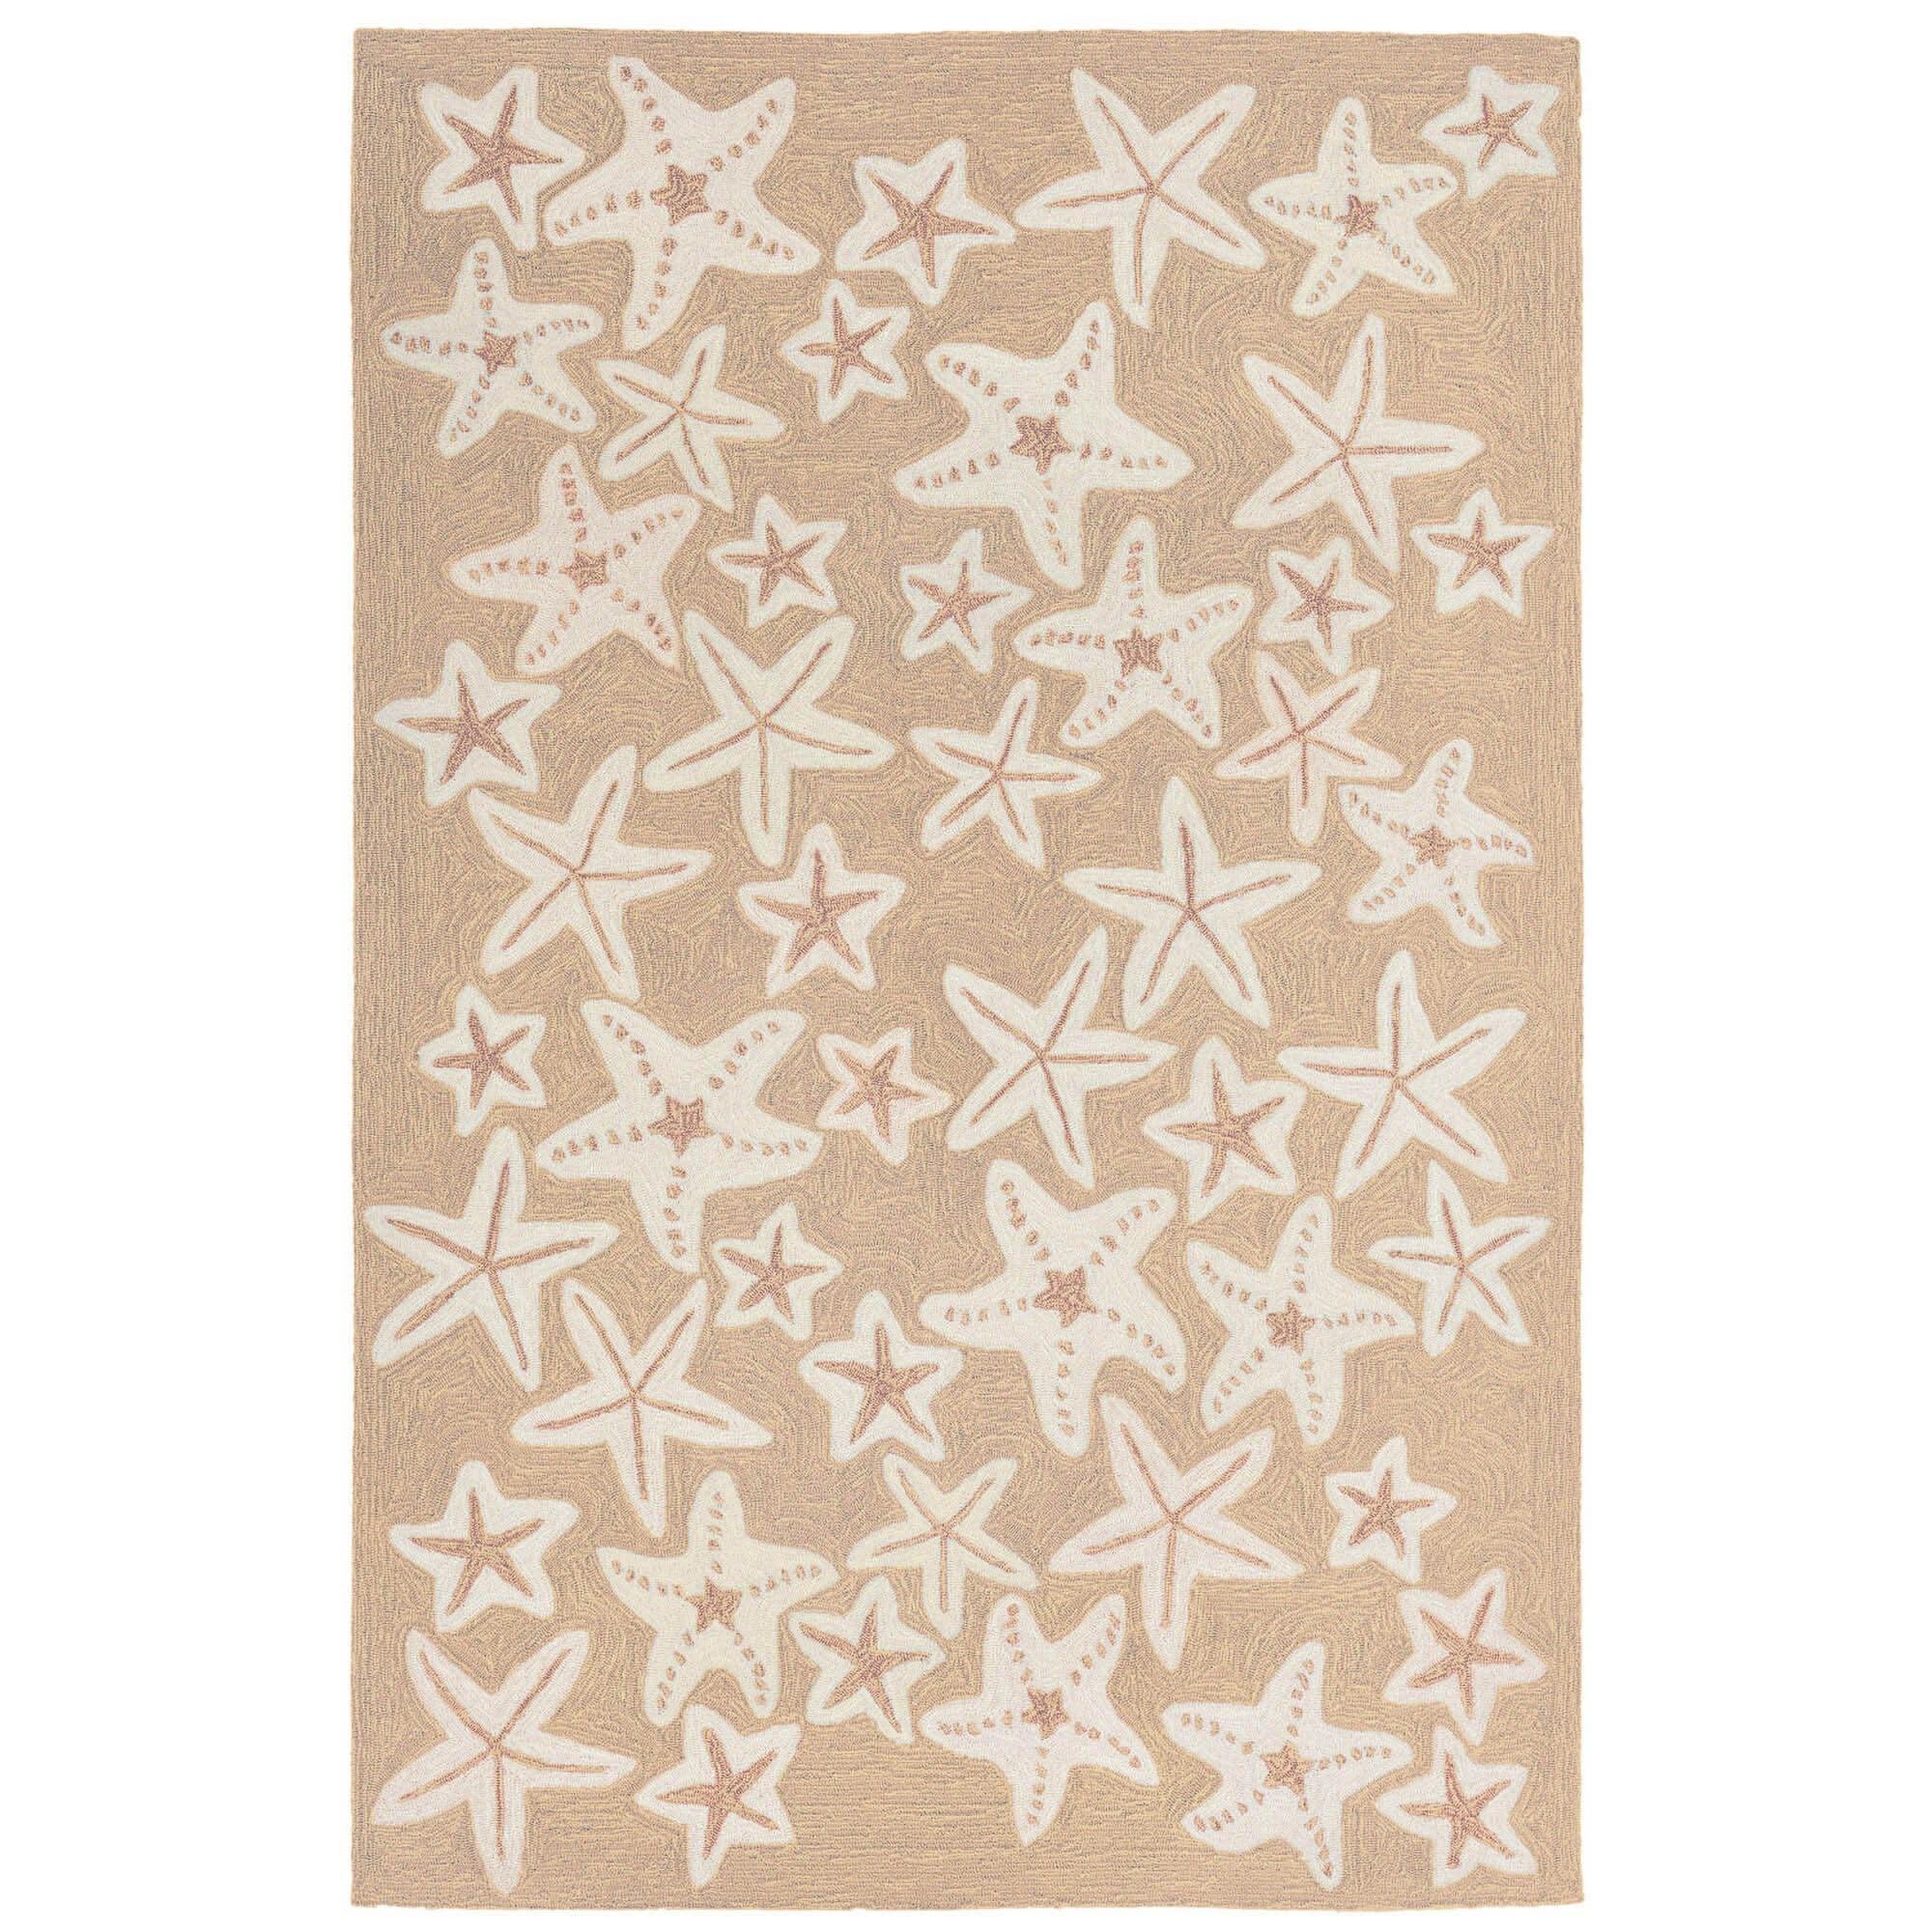 Starfish Neutral Capri Rug 24x36